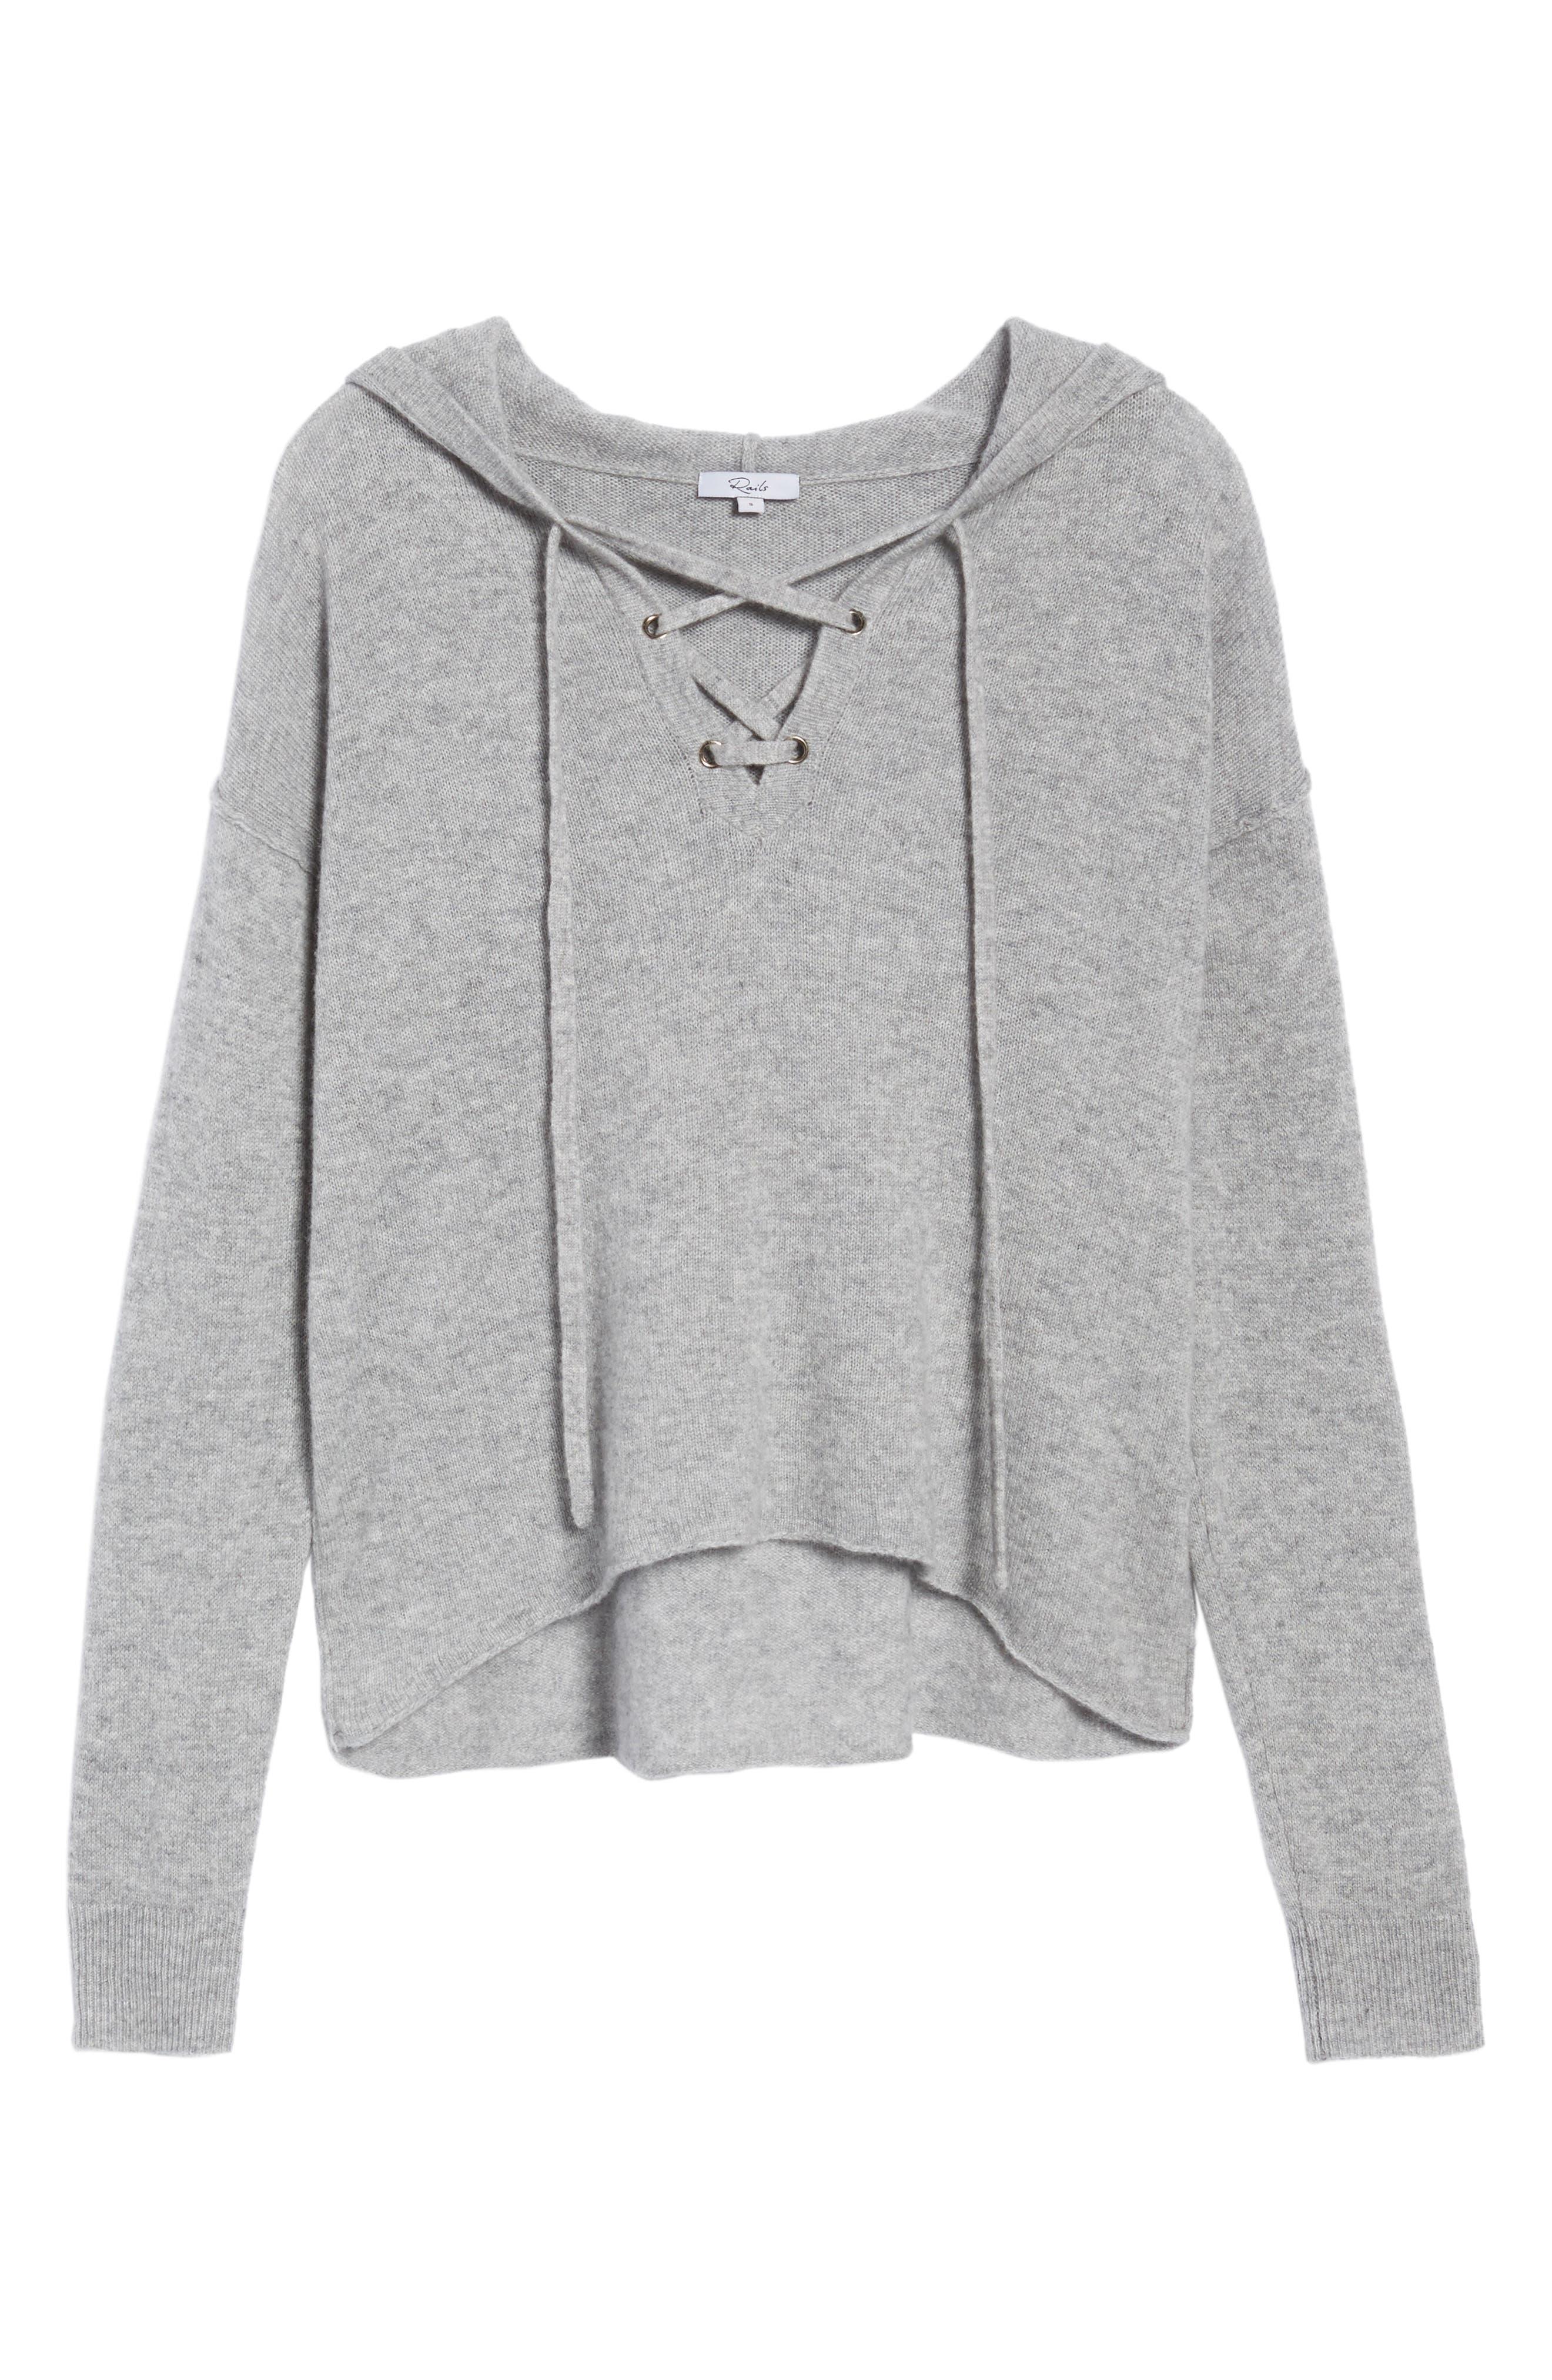 Dakota Cashmere Hooded Sweater,                             Alternate thumbnail 6, color,                             Heather Grey